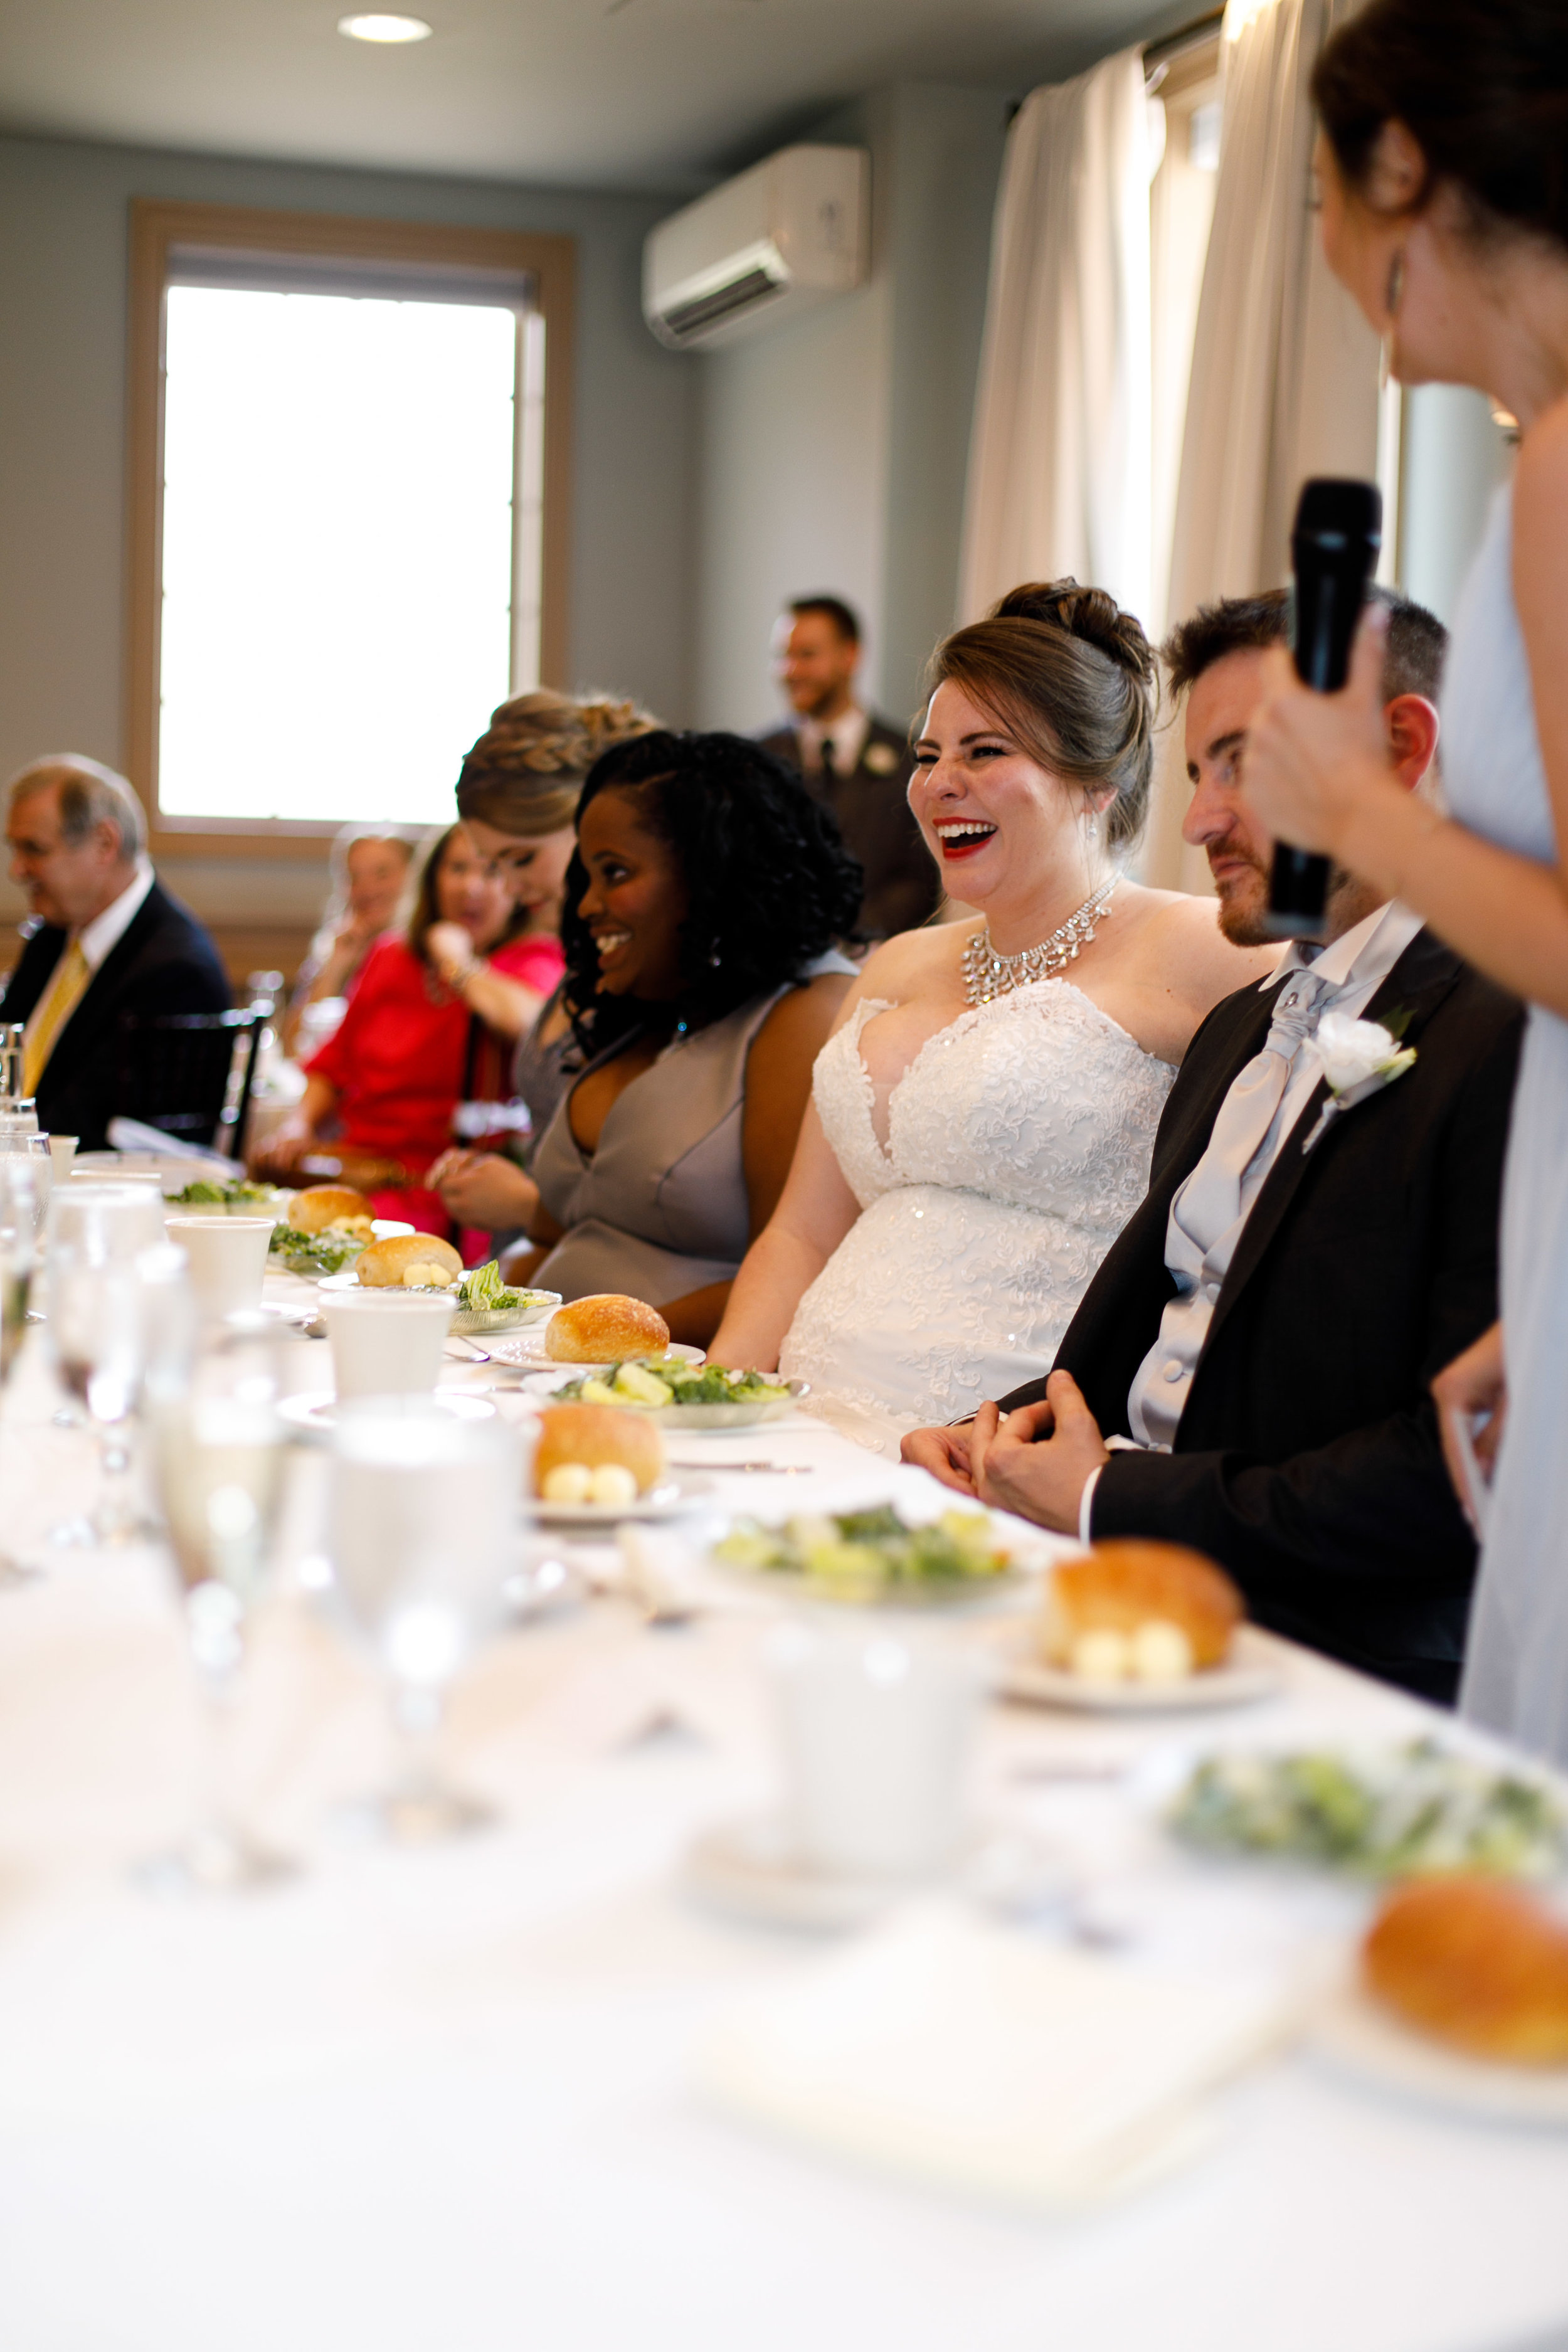 Wedding at Joseph Ambler In Bucks County PA40.jpg